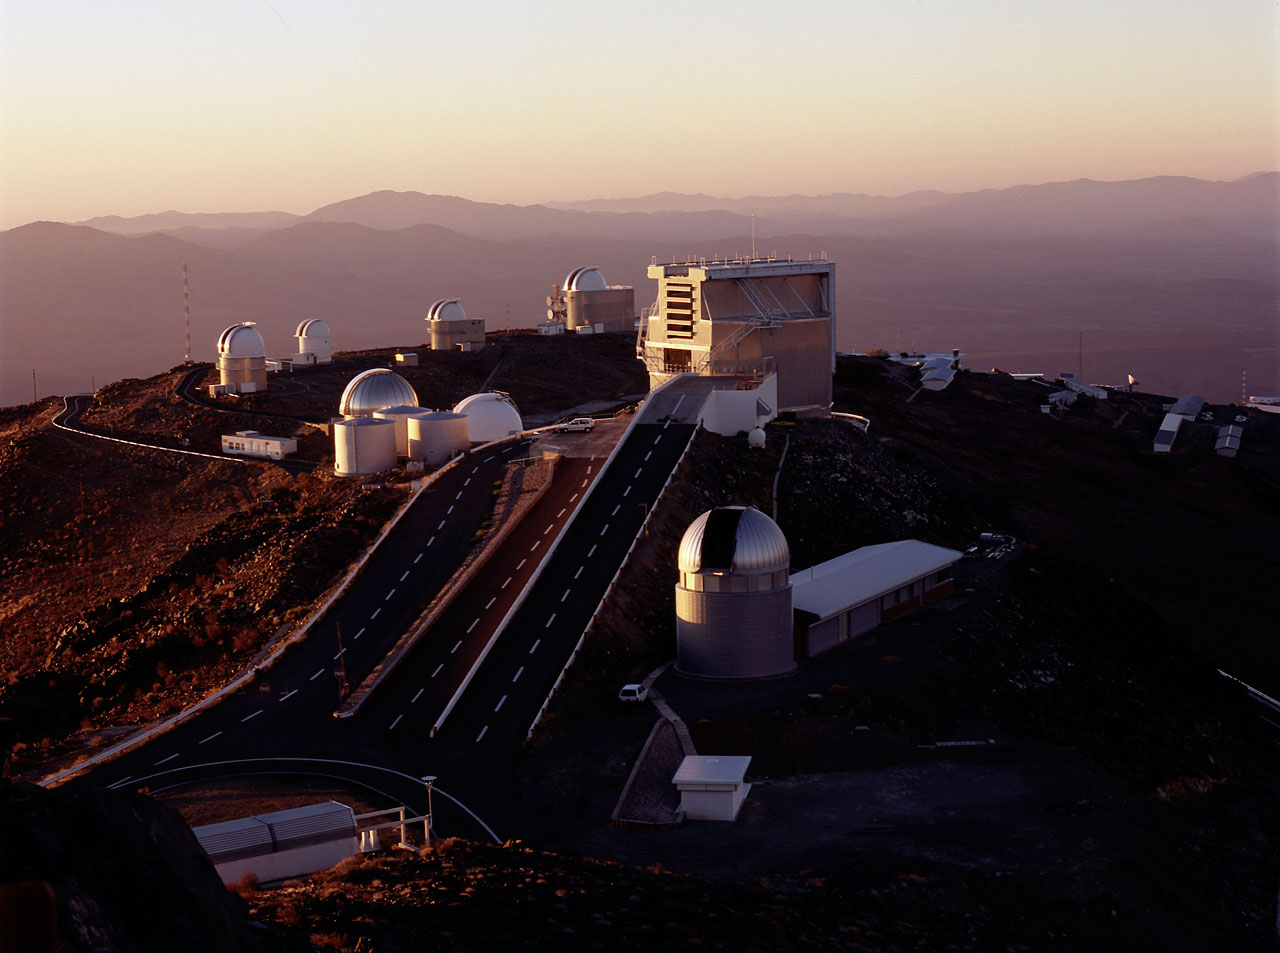 A vuelo de un quinde el blog astronom a for Sillas ergonomicas chile